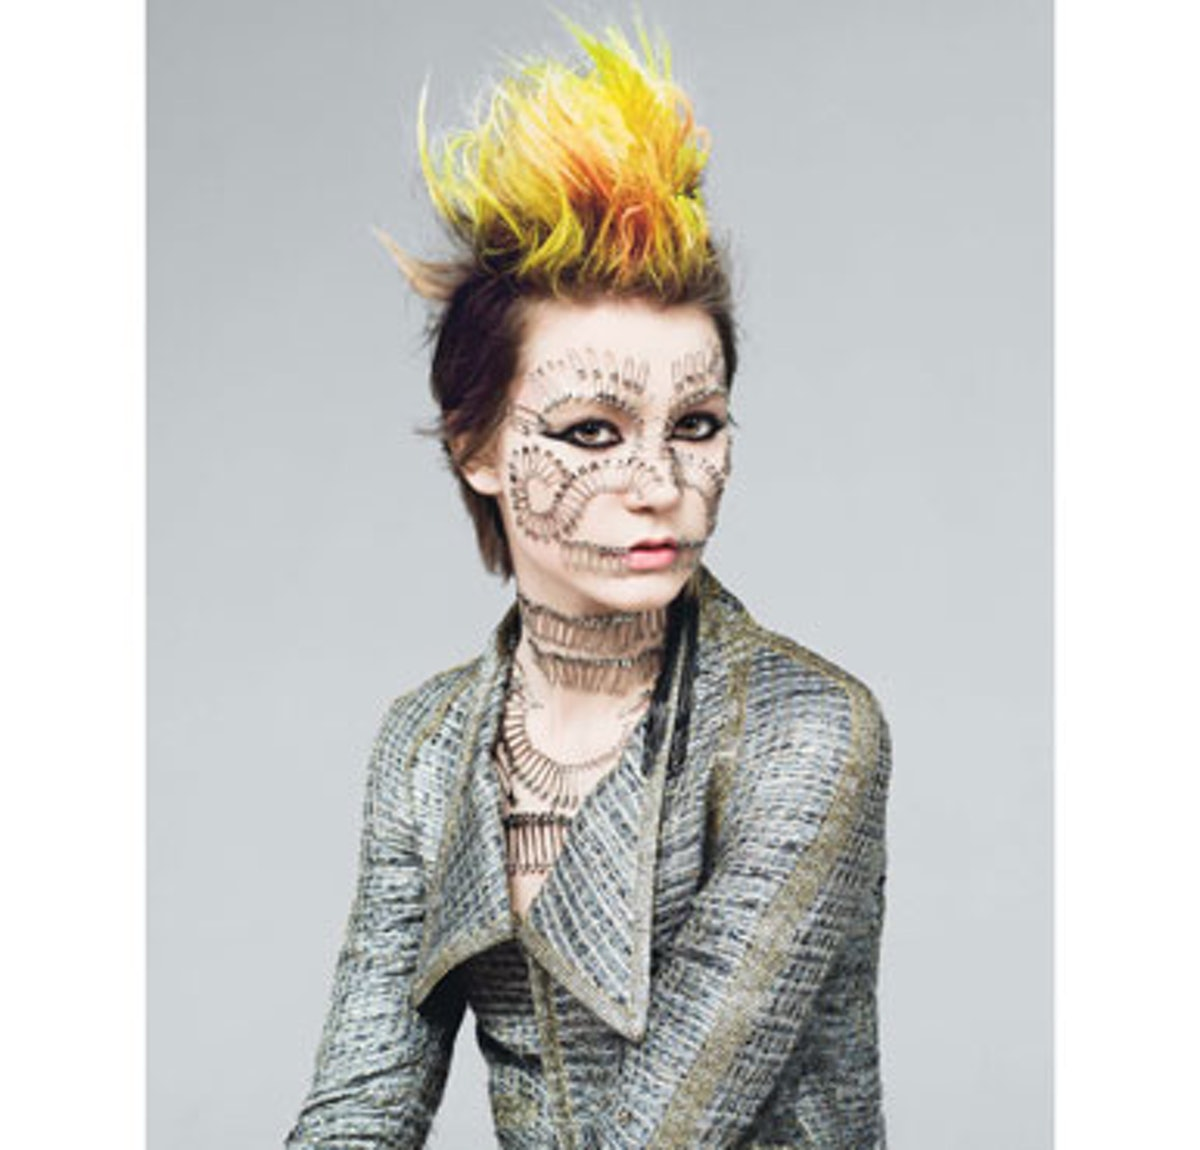 blog-mia-wasikowska-punk-01-v.jpg